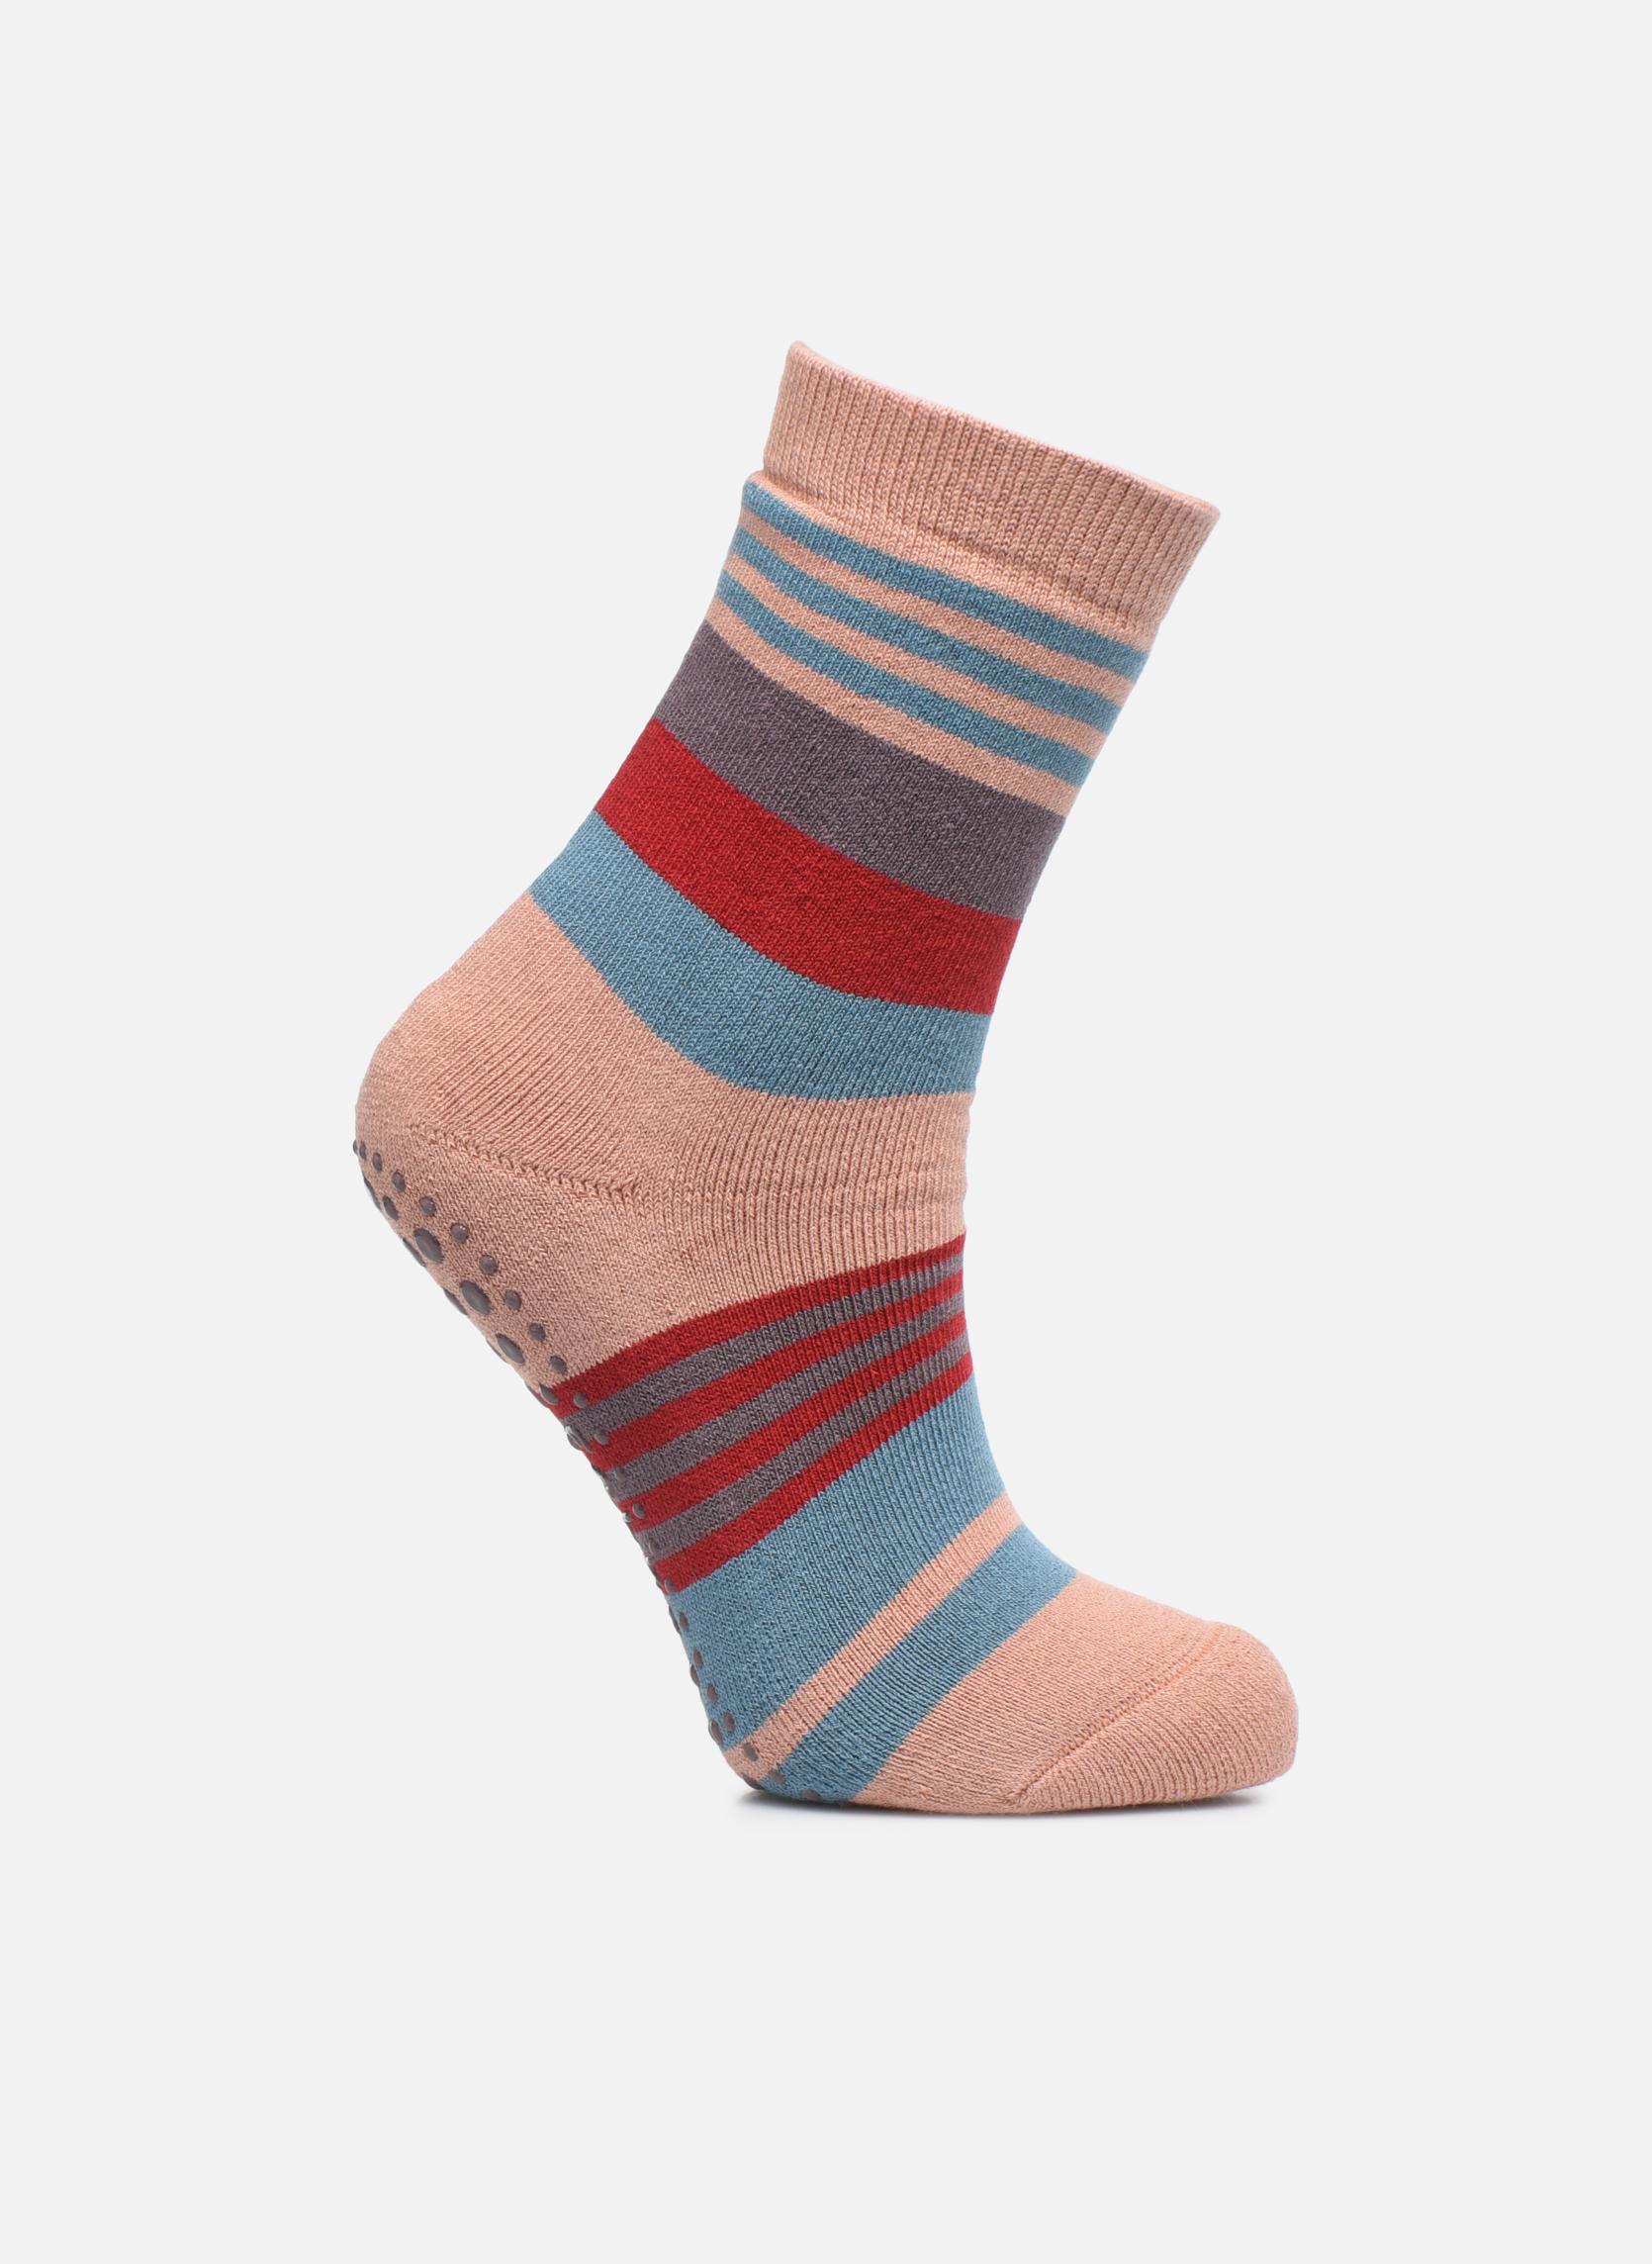 Chaussons-chaussettes Irregular Stripe Catspads 8849